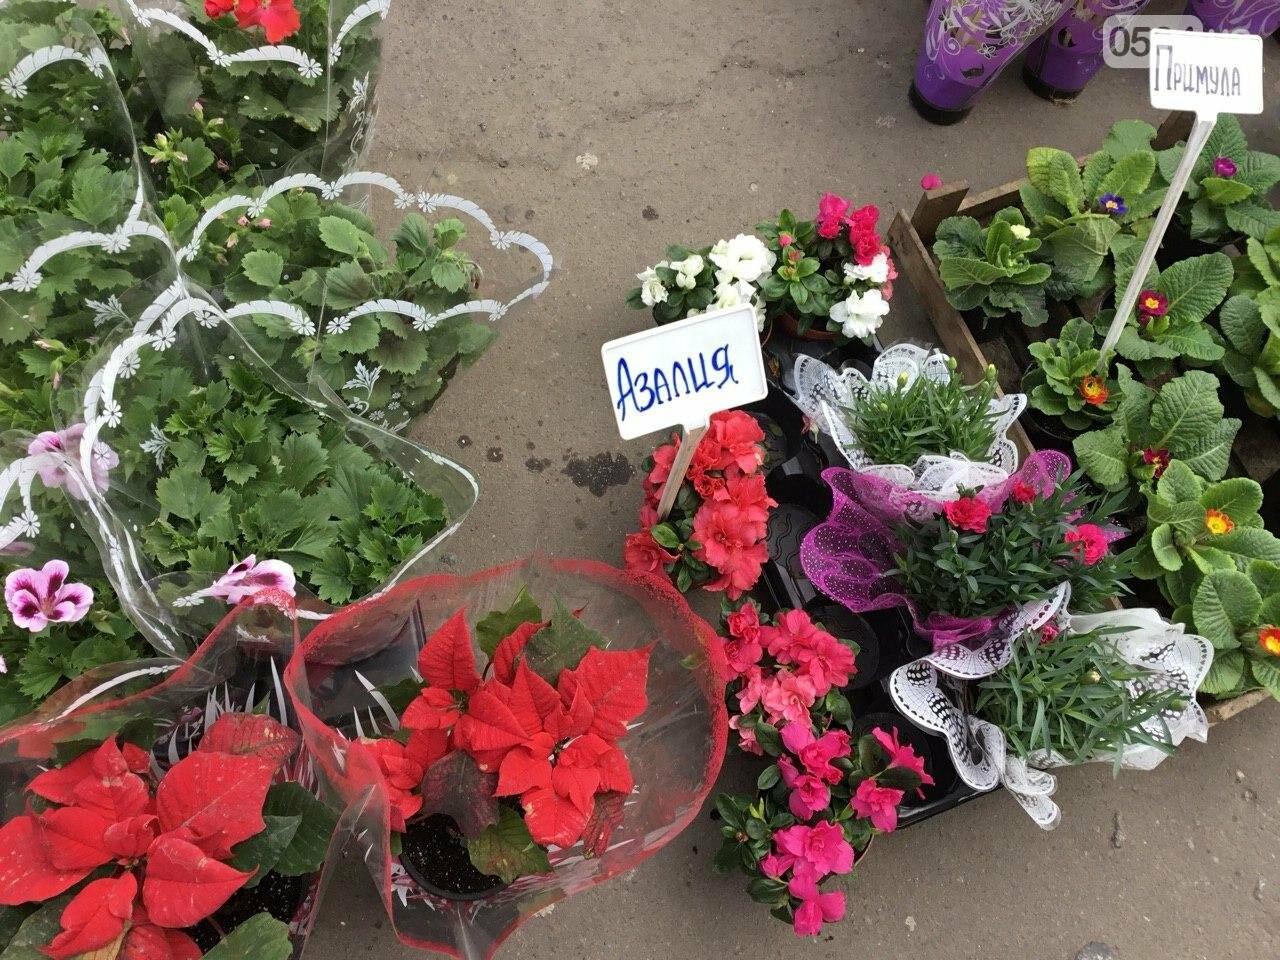 Сколько стоят примула, цикламен, мимоза? Обзор цен на цветы в Кривом Роге, - ФОТО, ВИДЕО, фото-29